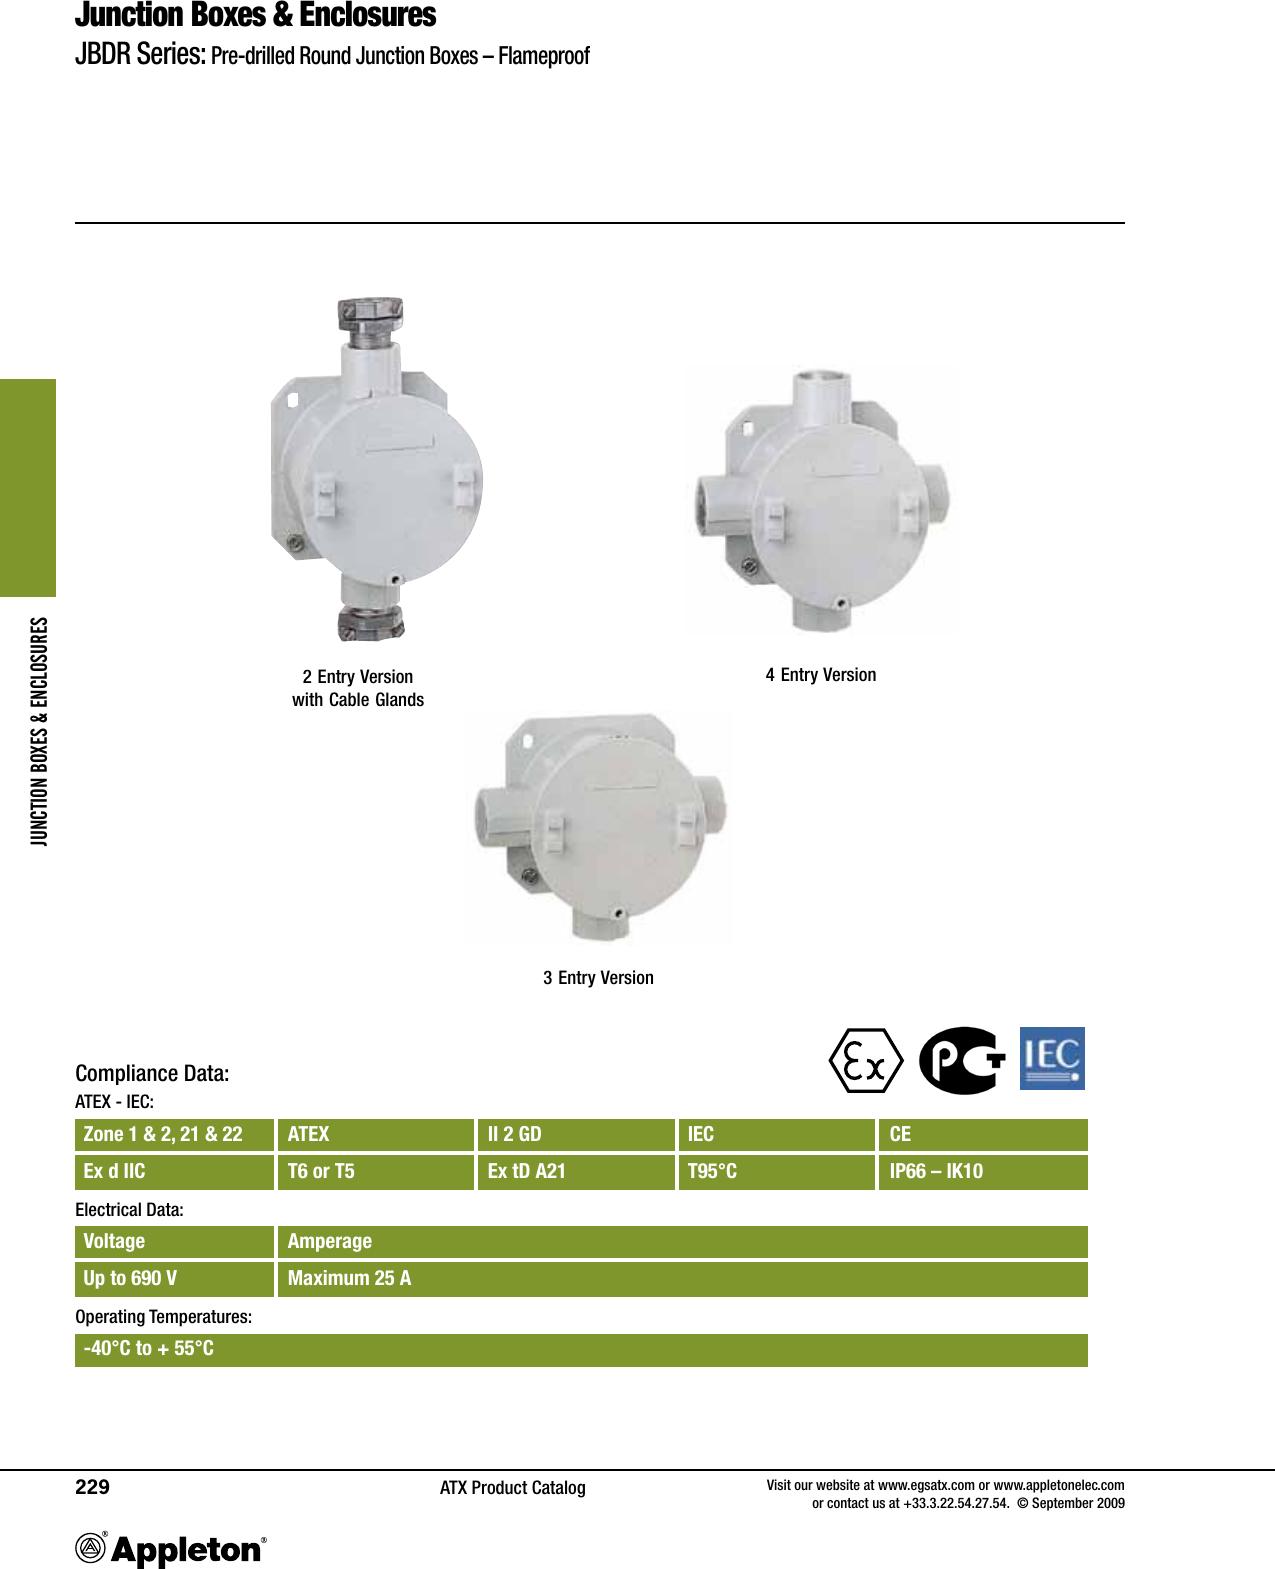 Radio Ford Diagram Factory Wiring Mr001633. . Wiring Diagram on